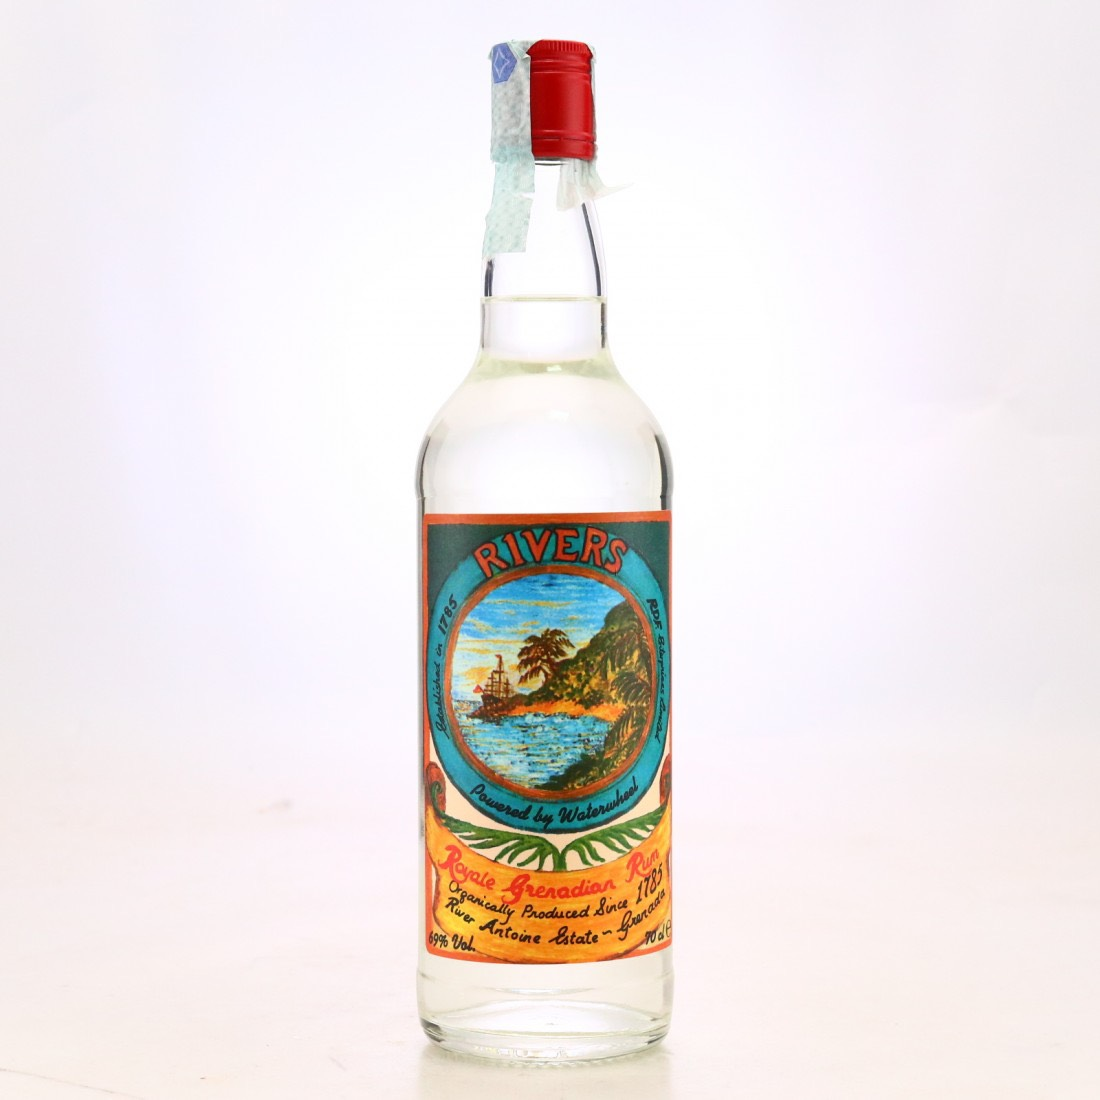 Bottle image of Rivers Royal Grenadian Rum